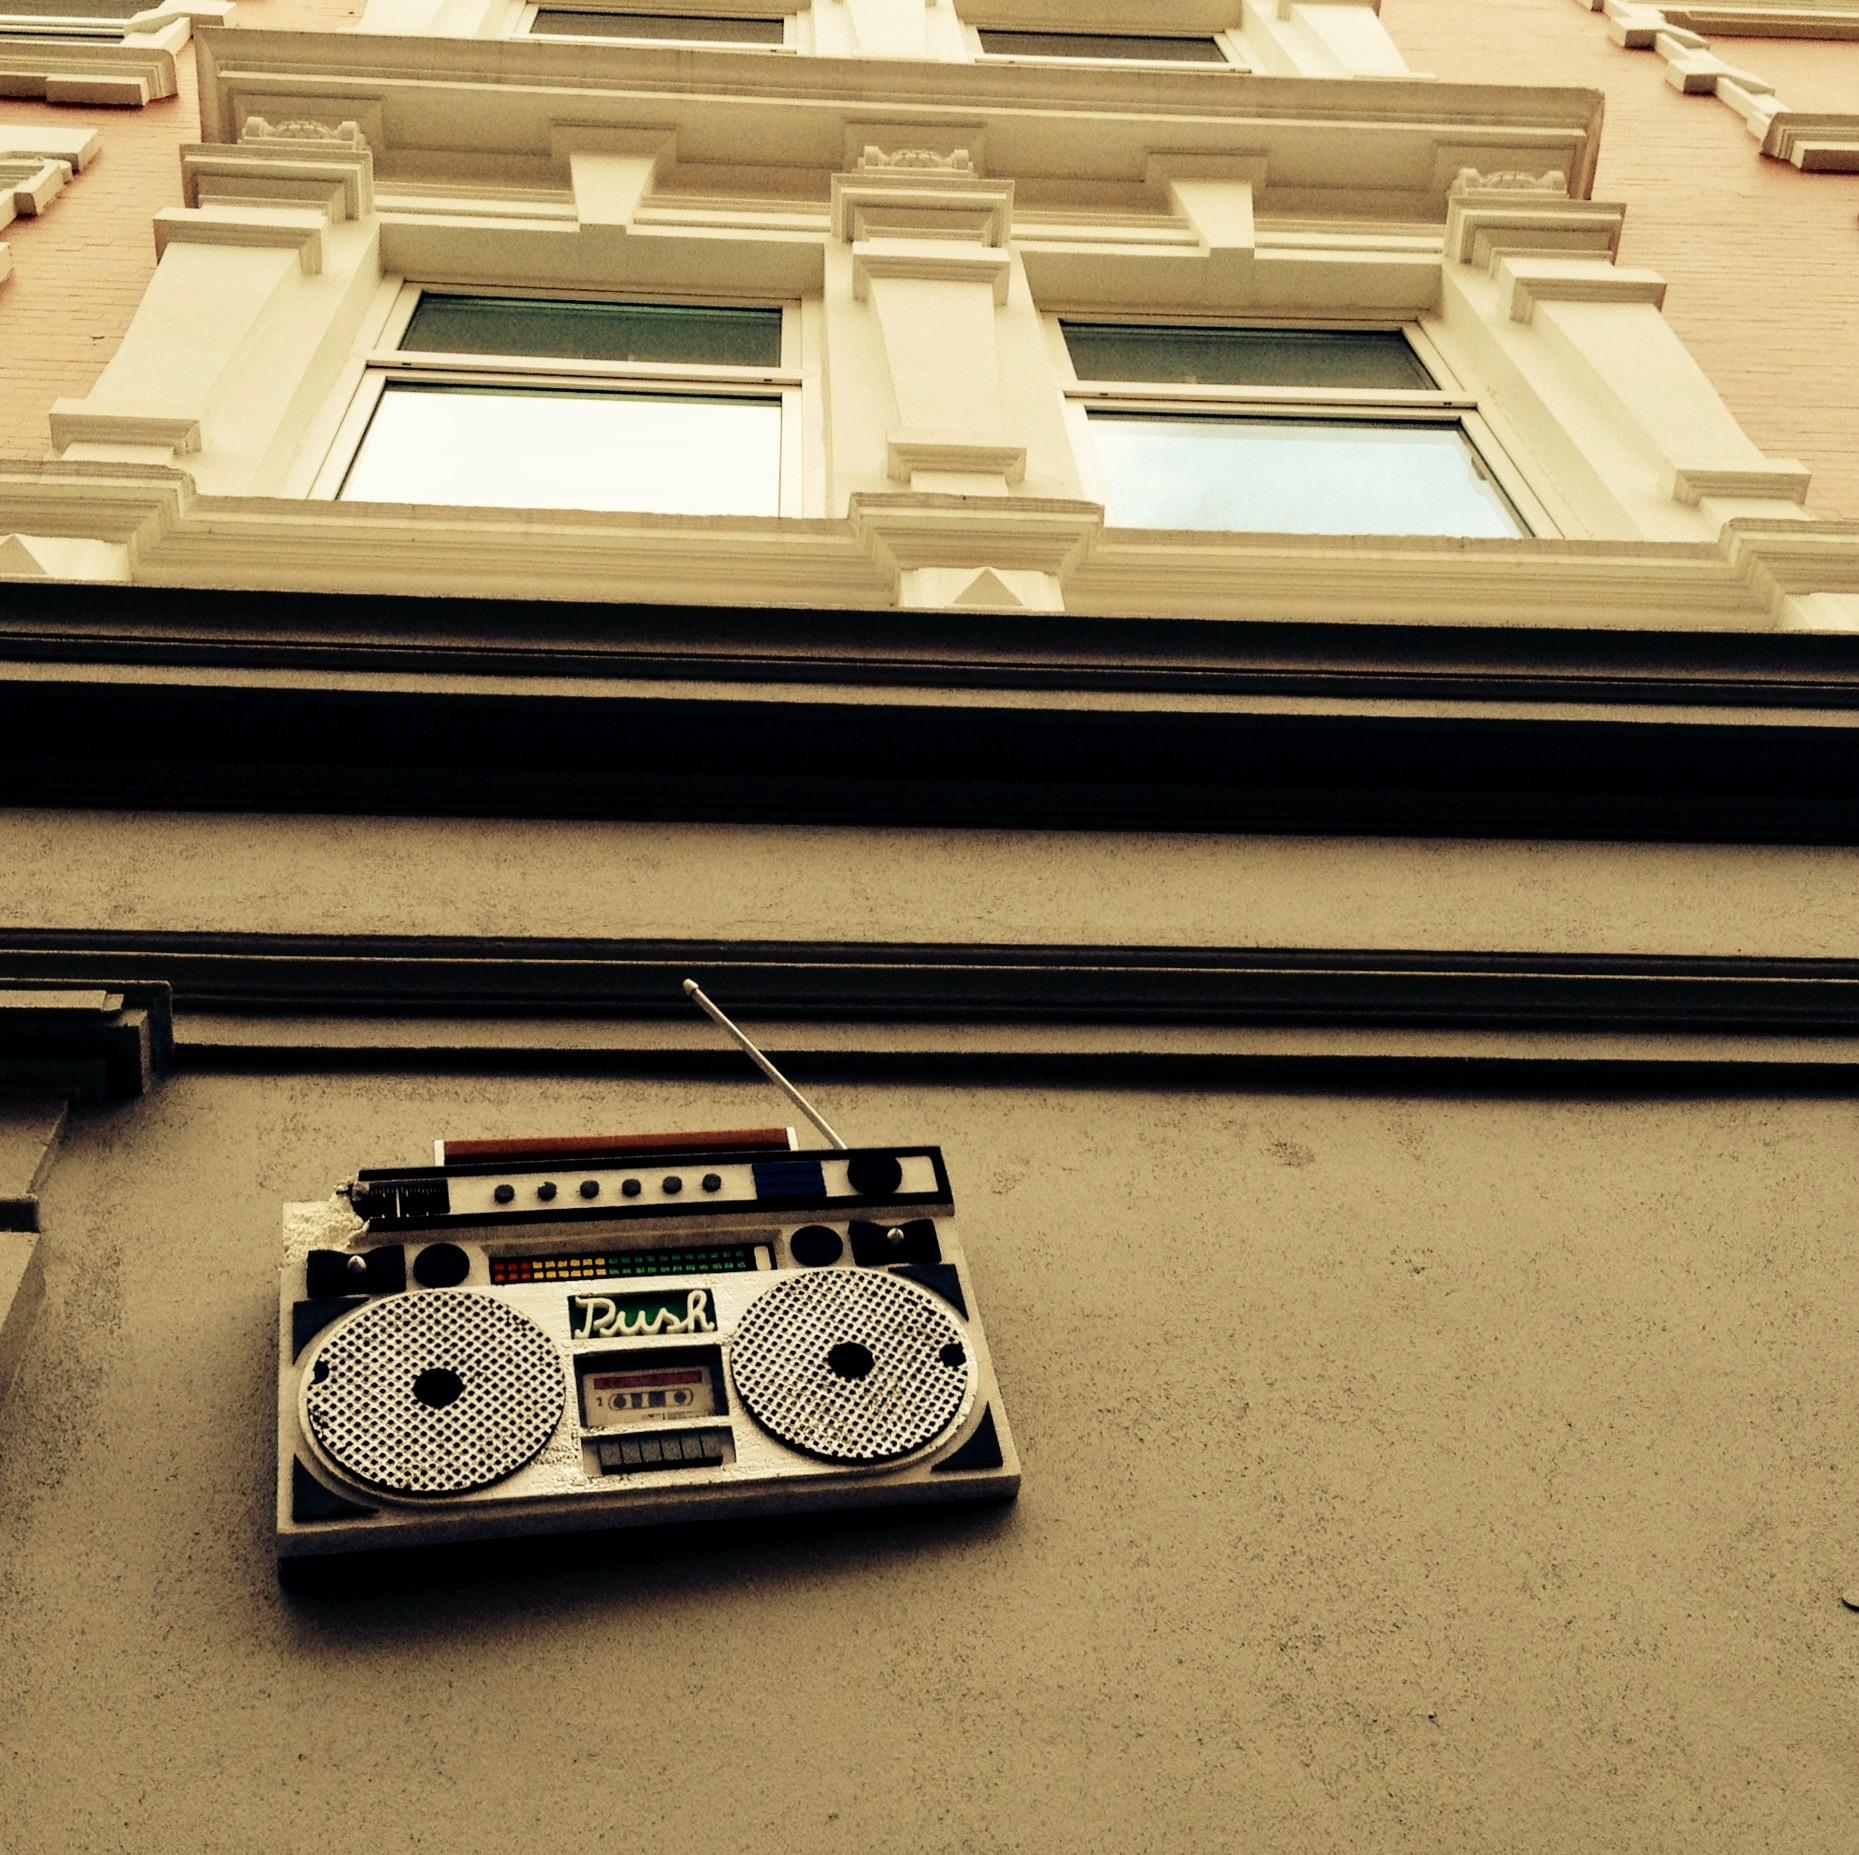 Radio an Hauswand © Elisabeth Wirth